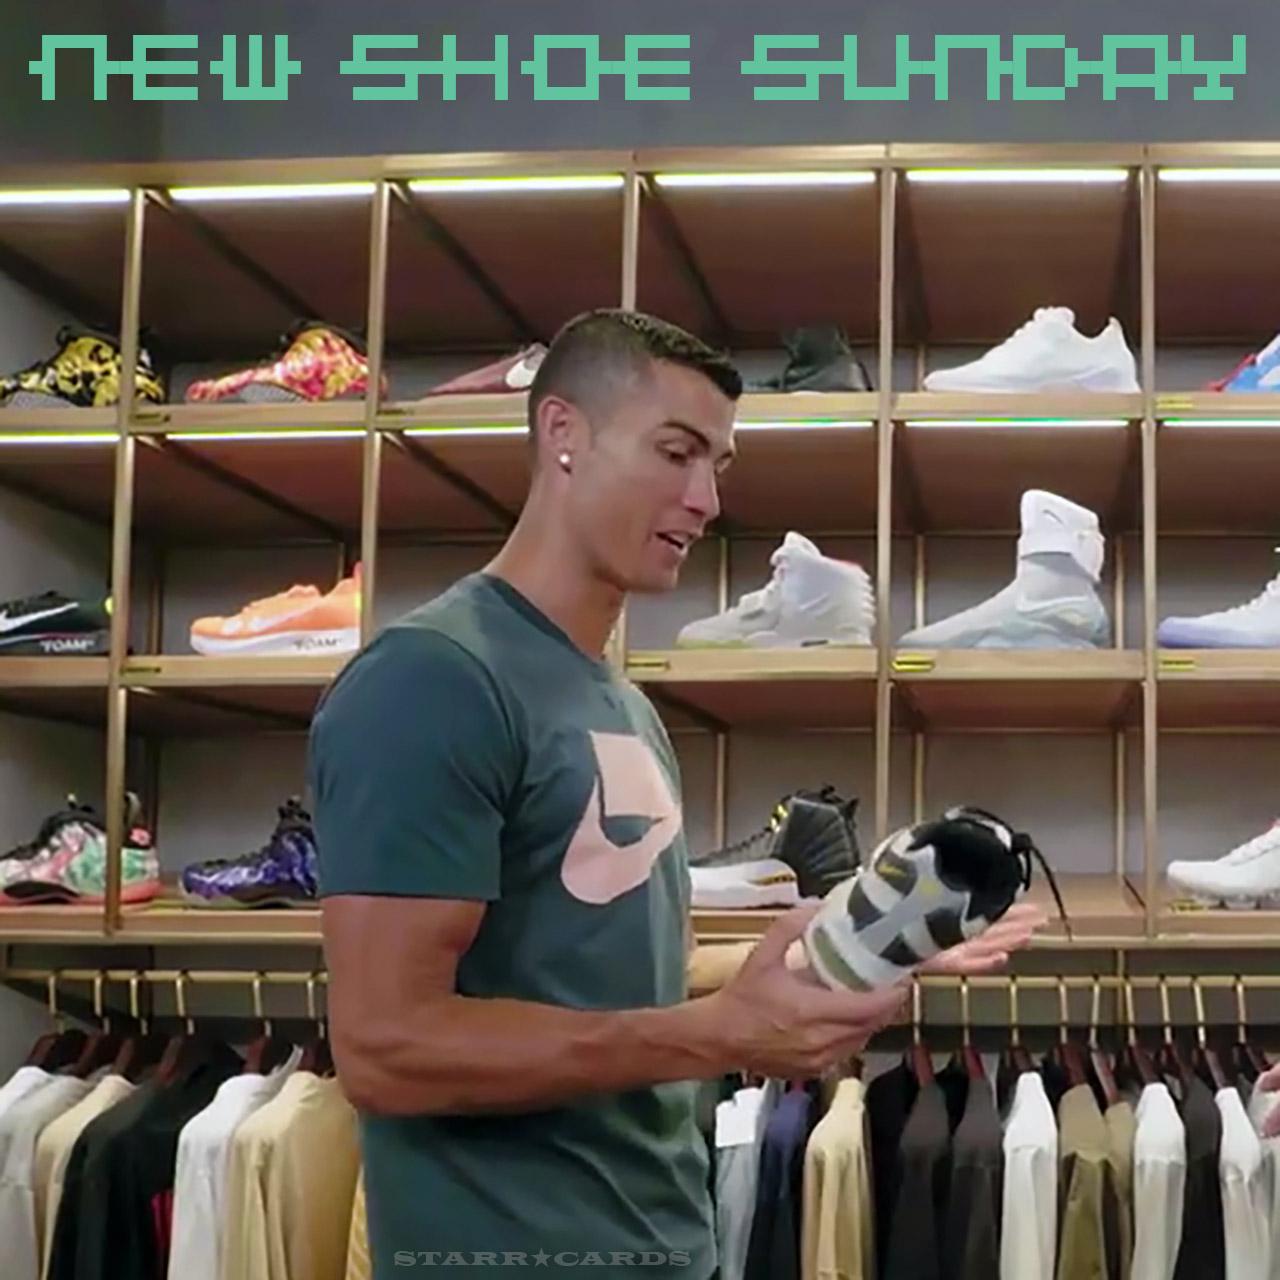 New Shoe Sunday: Cristiano Ronaldo goes sneaker shopping in